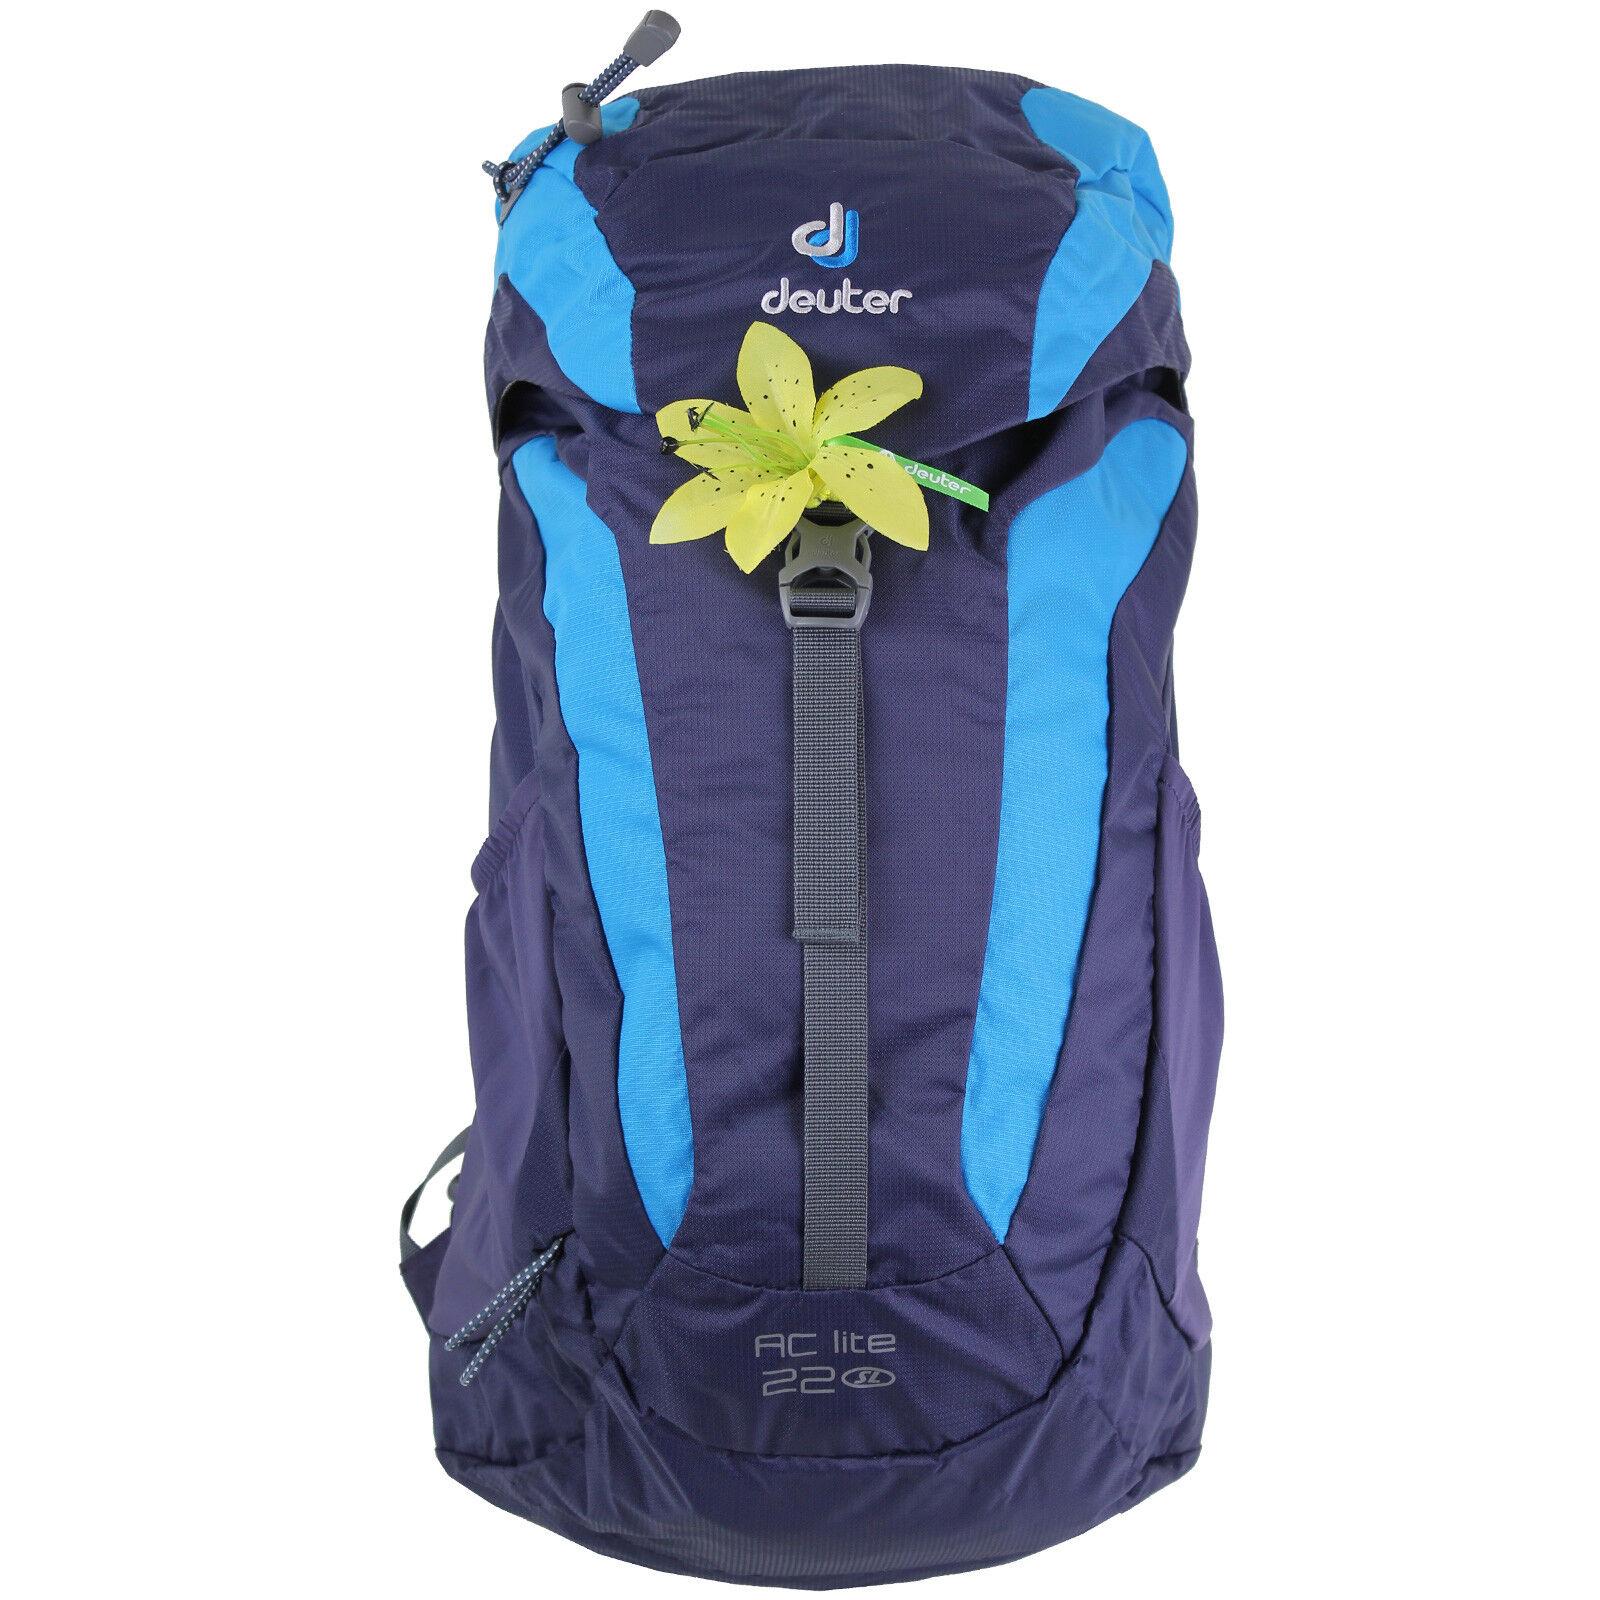 f455459d85e Deuter AC Lite Hiking Backpack Mountain Rucksack 3420216-3349 ...